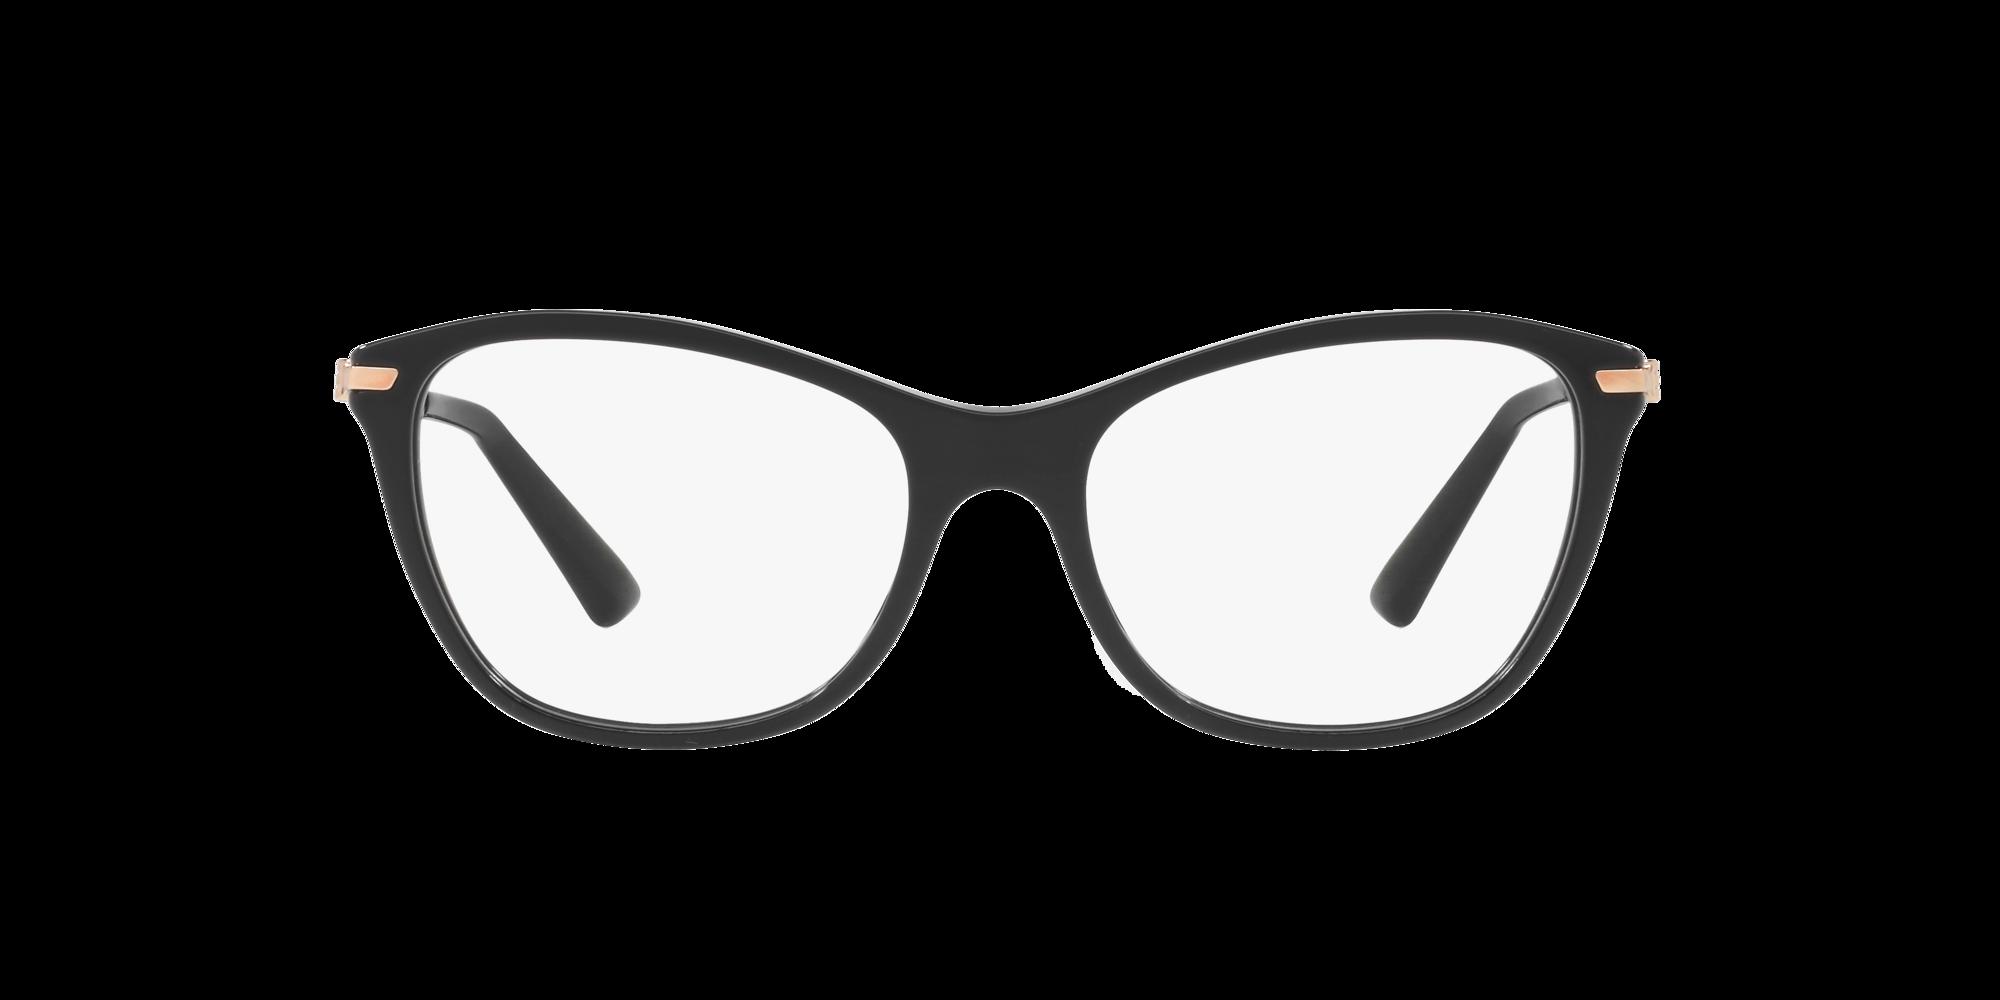 Image for BV4147 from LensCrafters | Glasses, Prescription Glasses Online, Eyewear